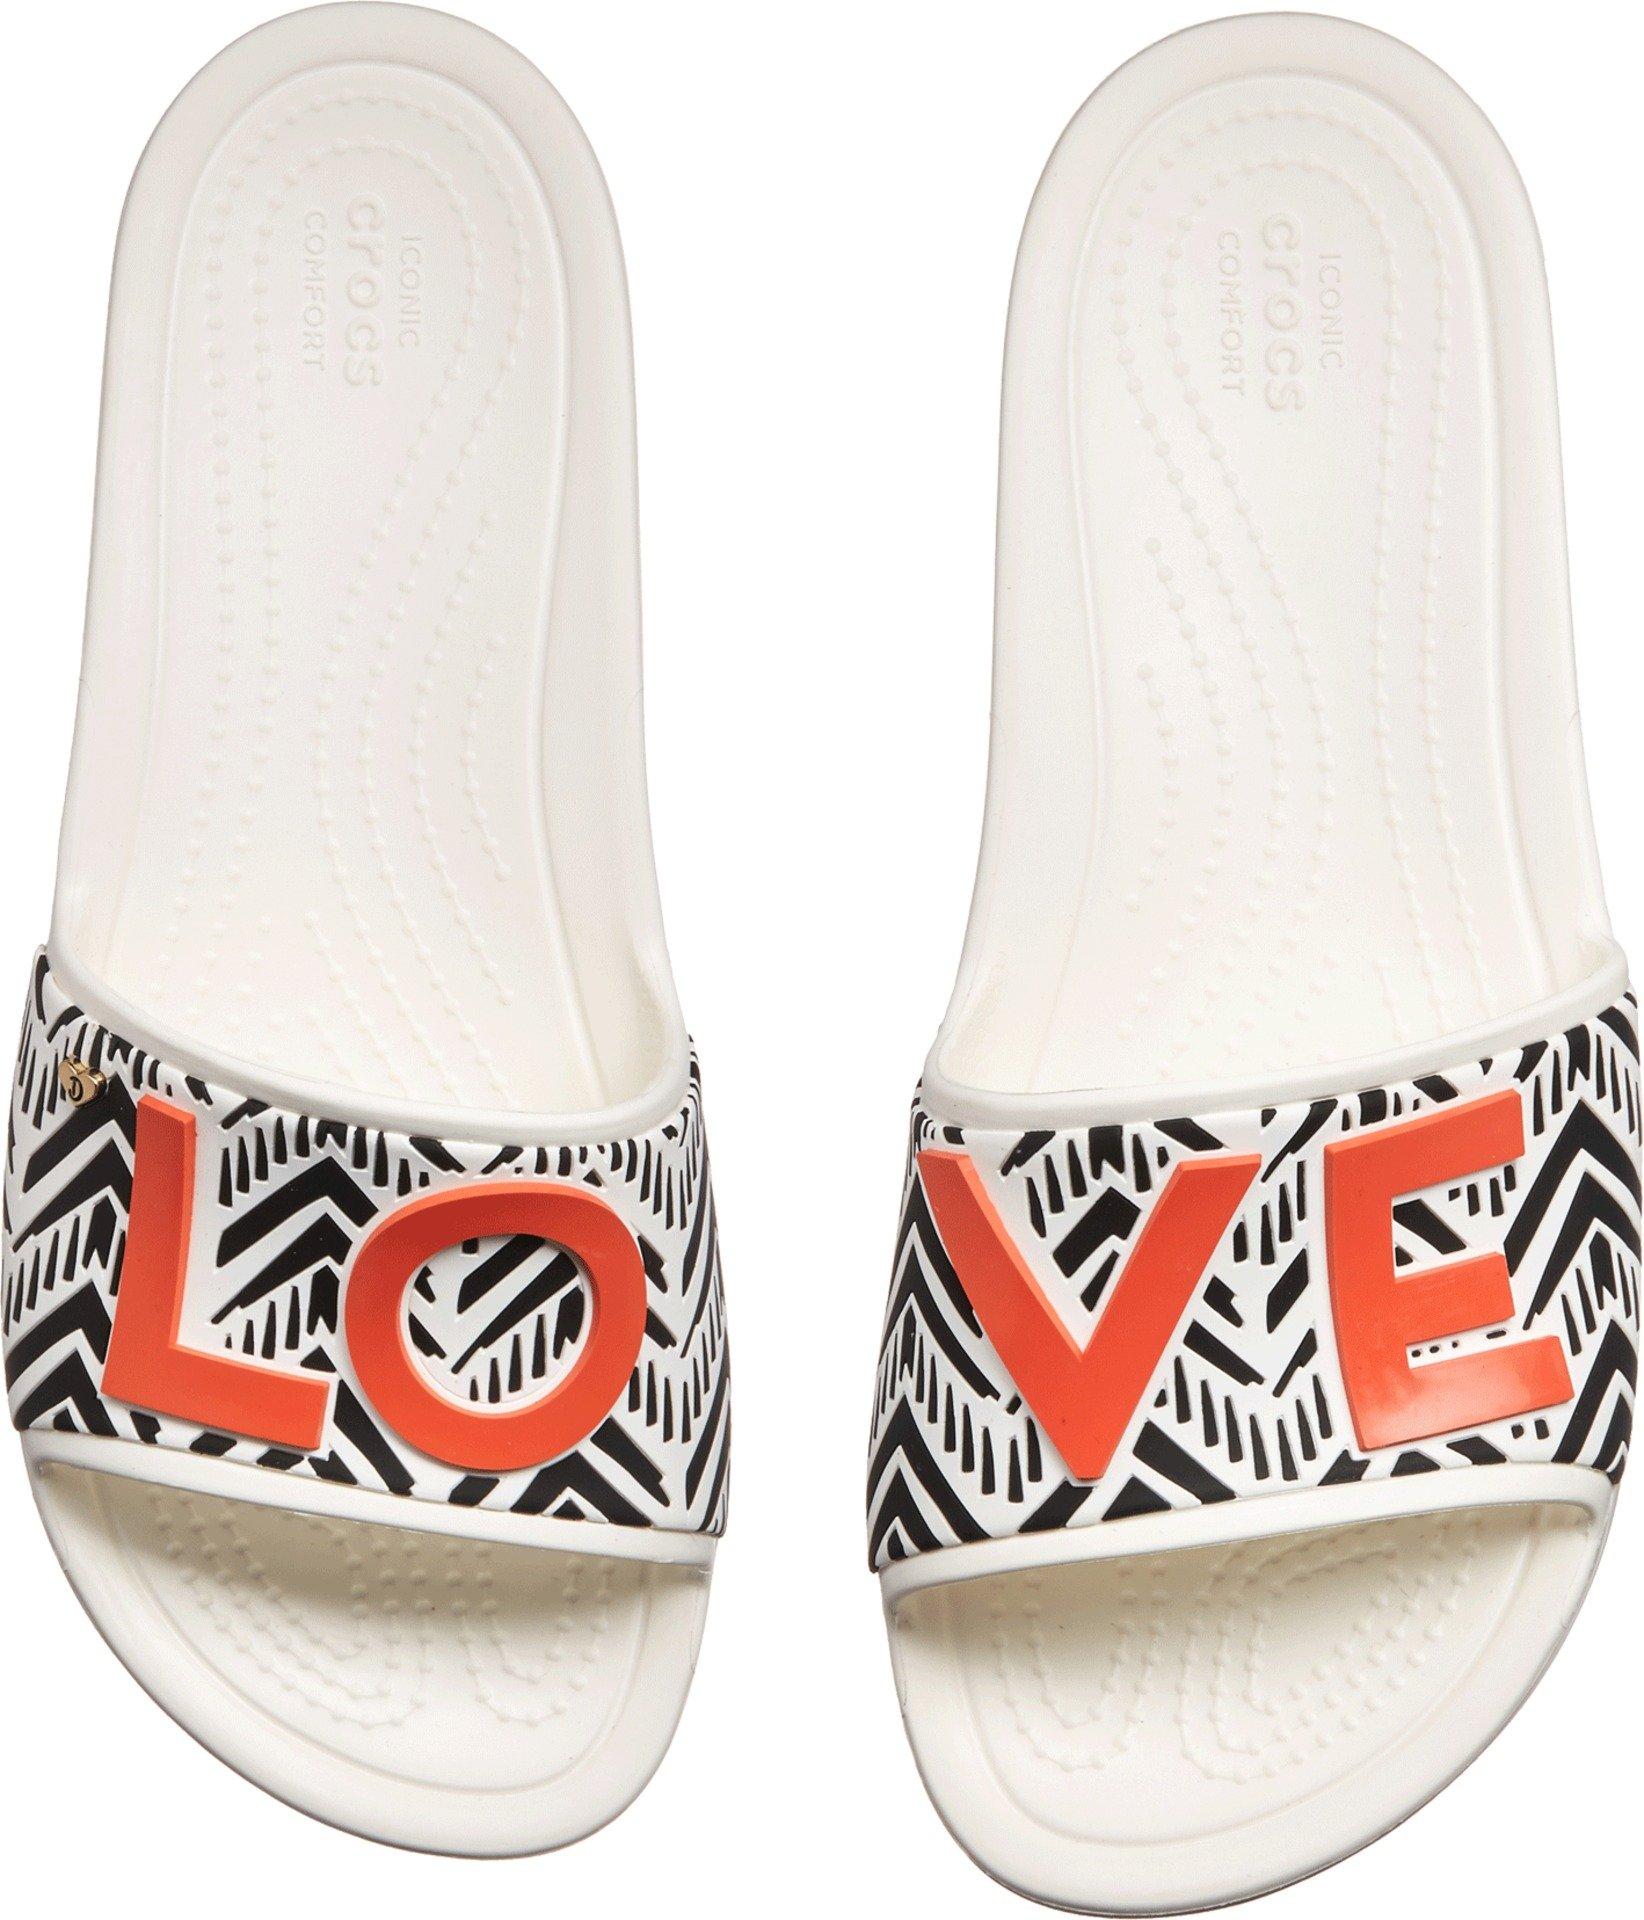 Crocs Women's Drew Barrymore Sloane Chevron Slide Flat Sandal, White, 7 M US